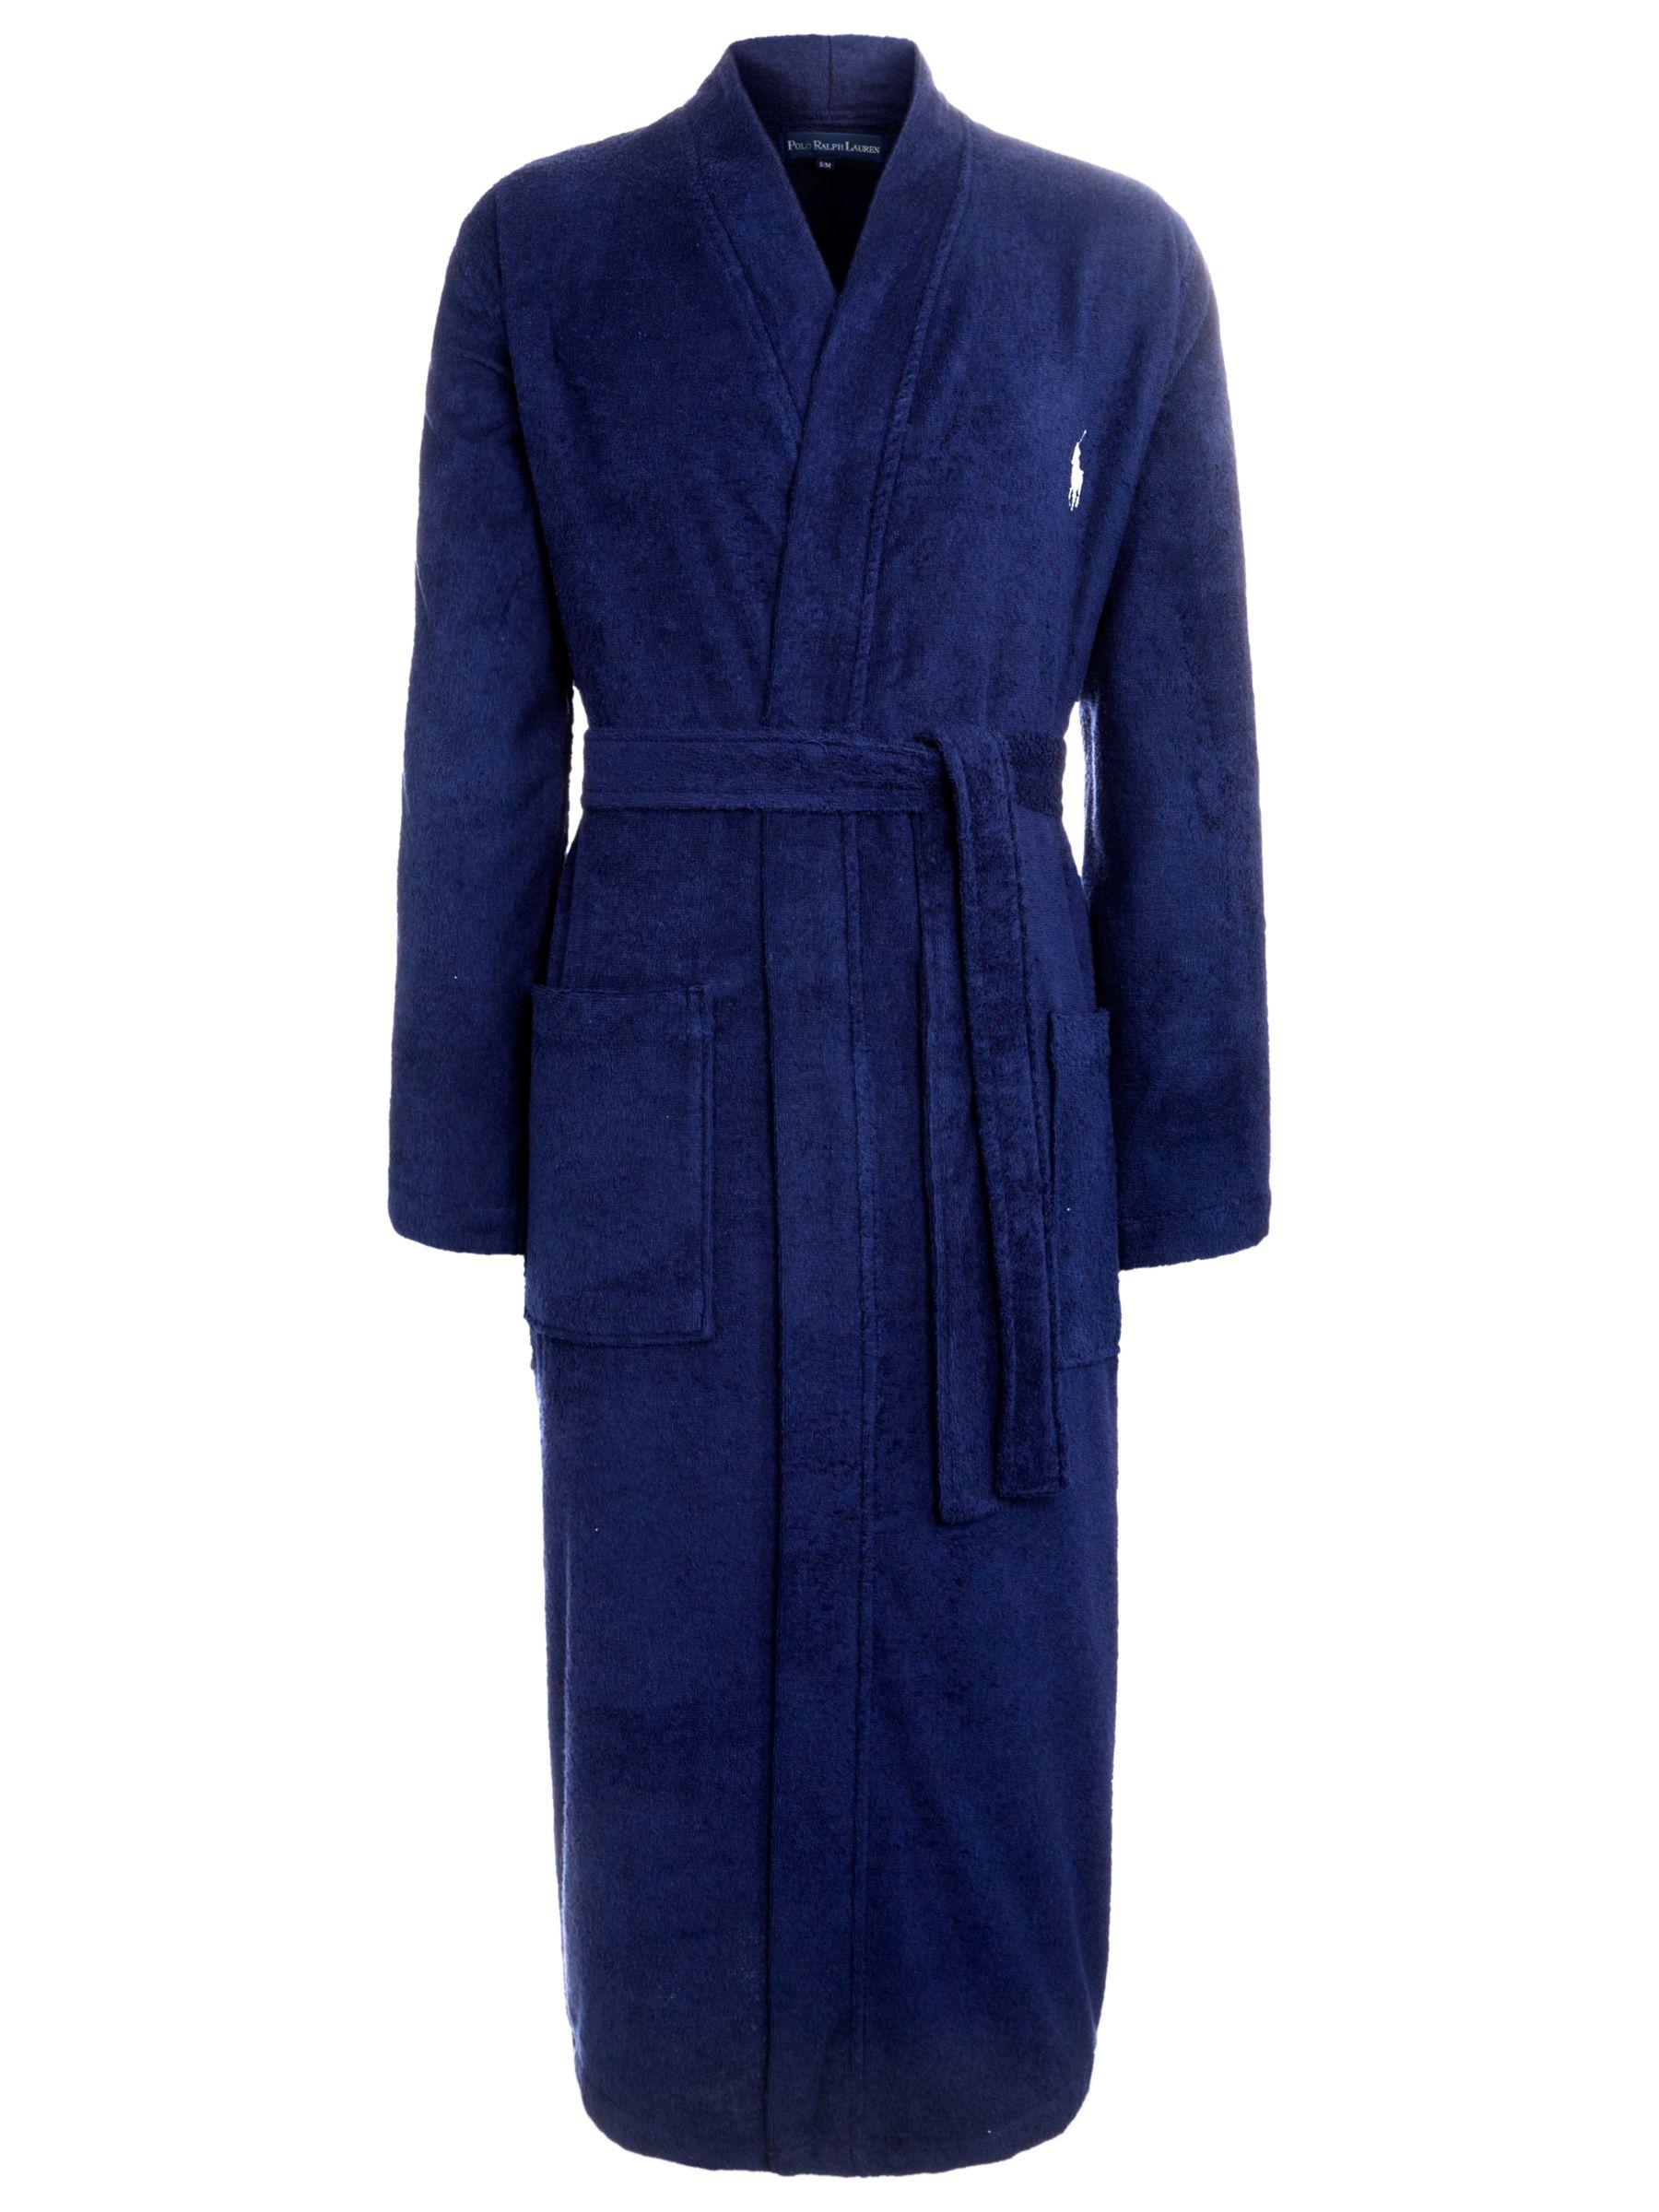 Polo Ralph Lauren Cotton Dressing Robe, Navy